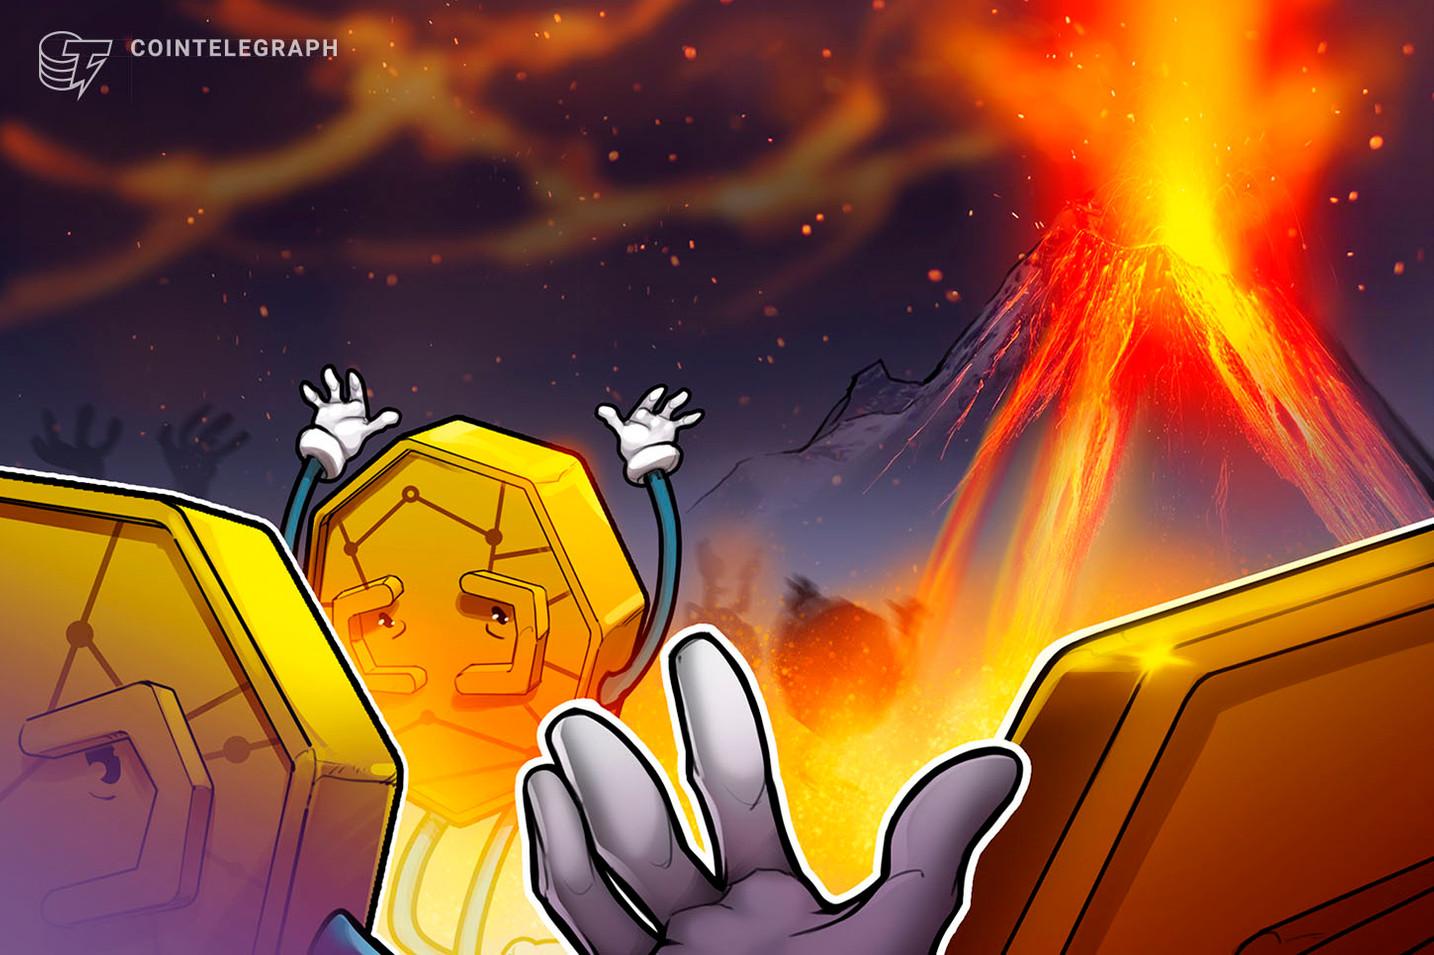 Friday Shows Bloodbath for Crypto Markets, Bitcoin Price At $7,300